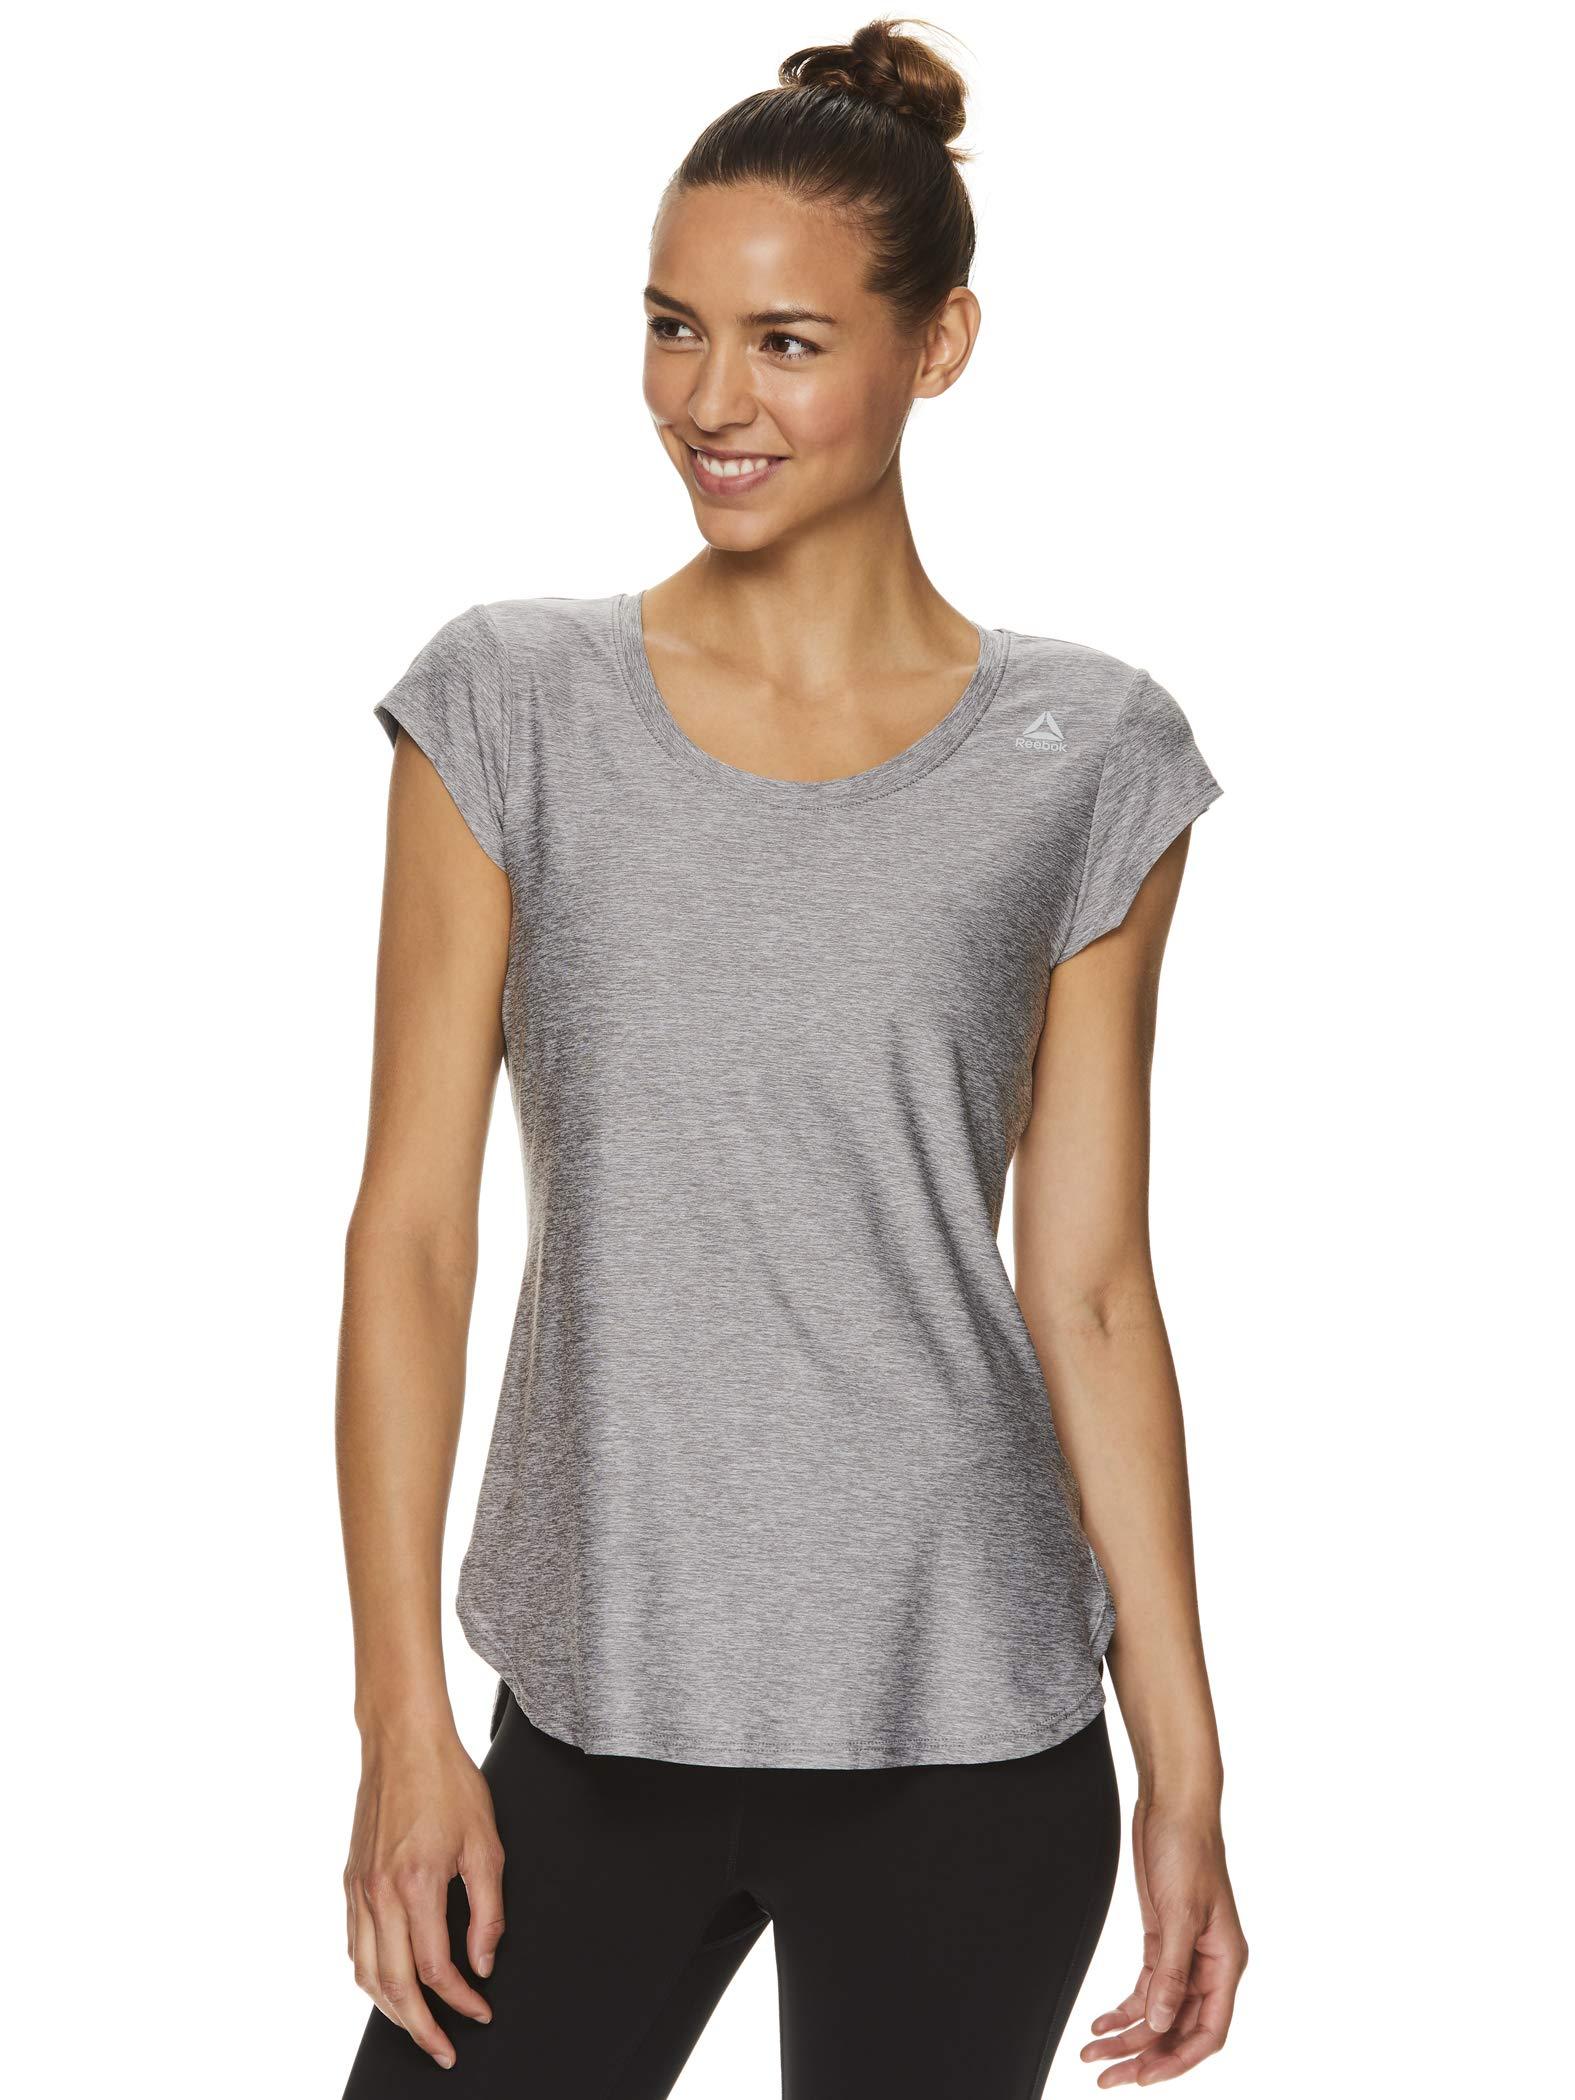 Reebok Women's Legend Running & Gym T-Shirt - Performance Short Sleeve Workout Clothes for Women - Quietshade Heather Legend Grey, X-Small by Reebok